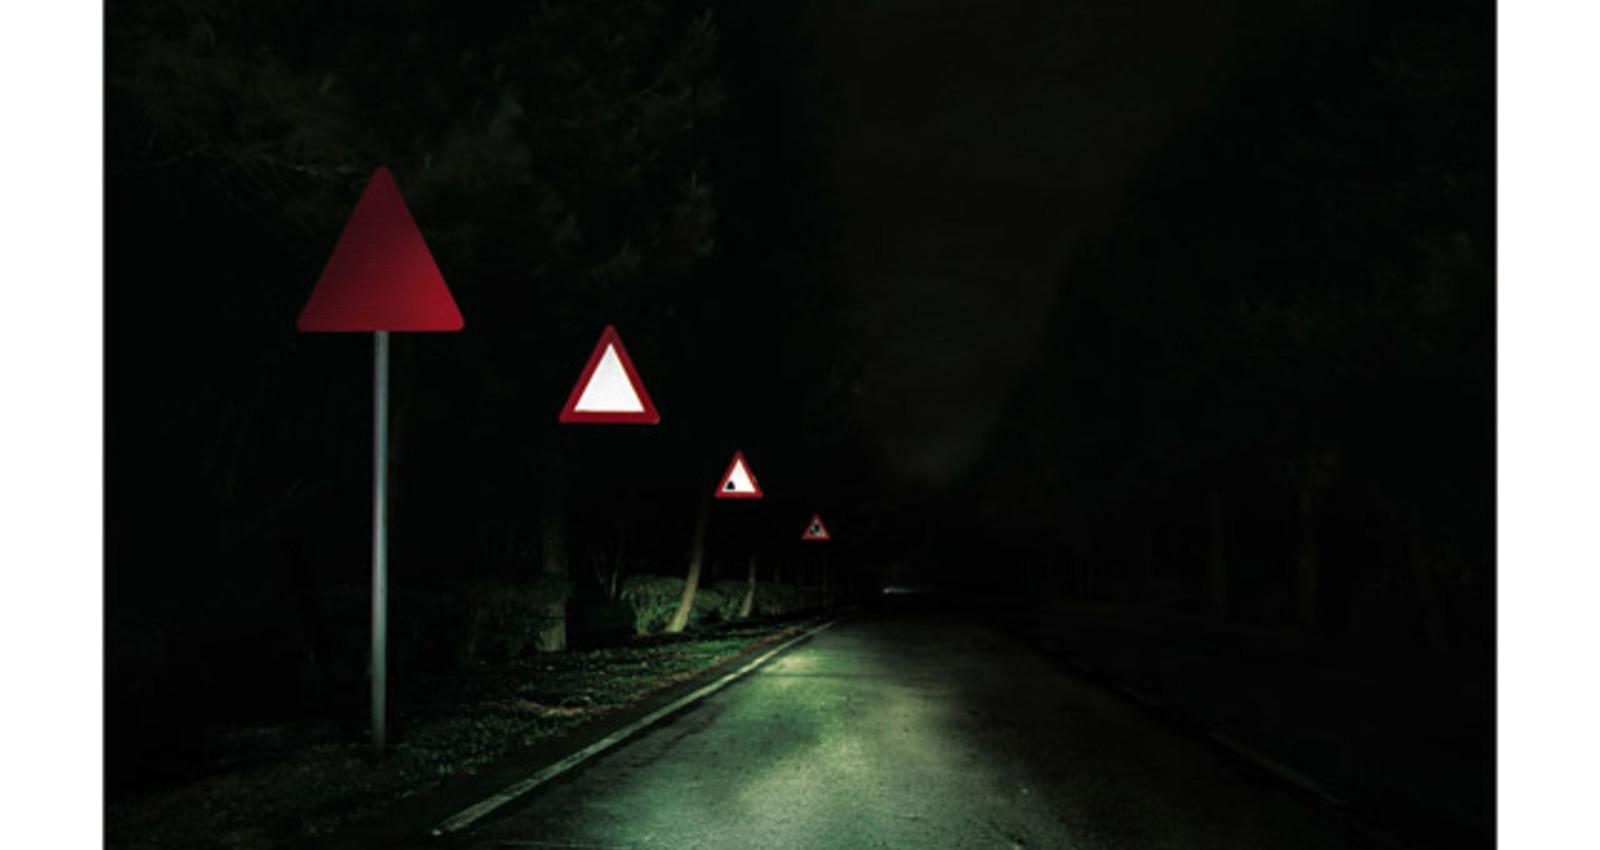 Stop/Traffic Light/Roadworks/Cliff